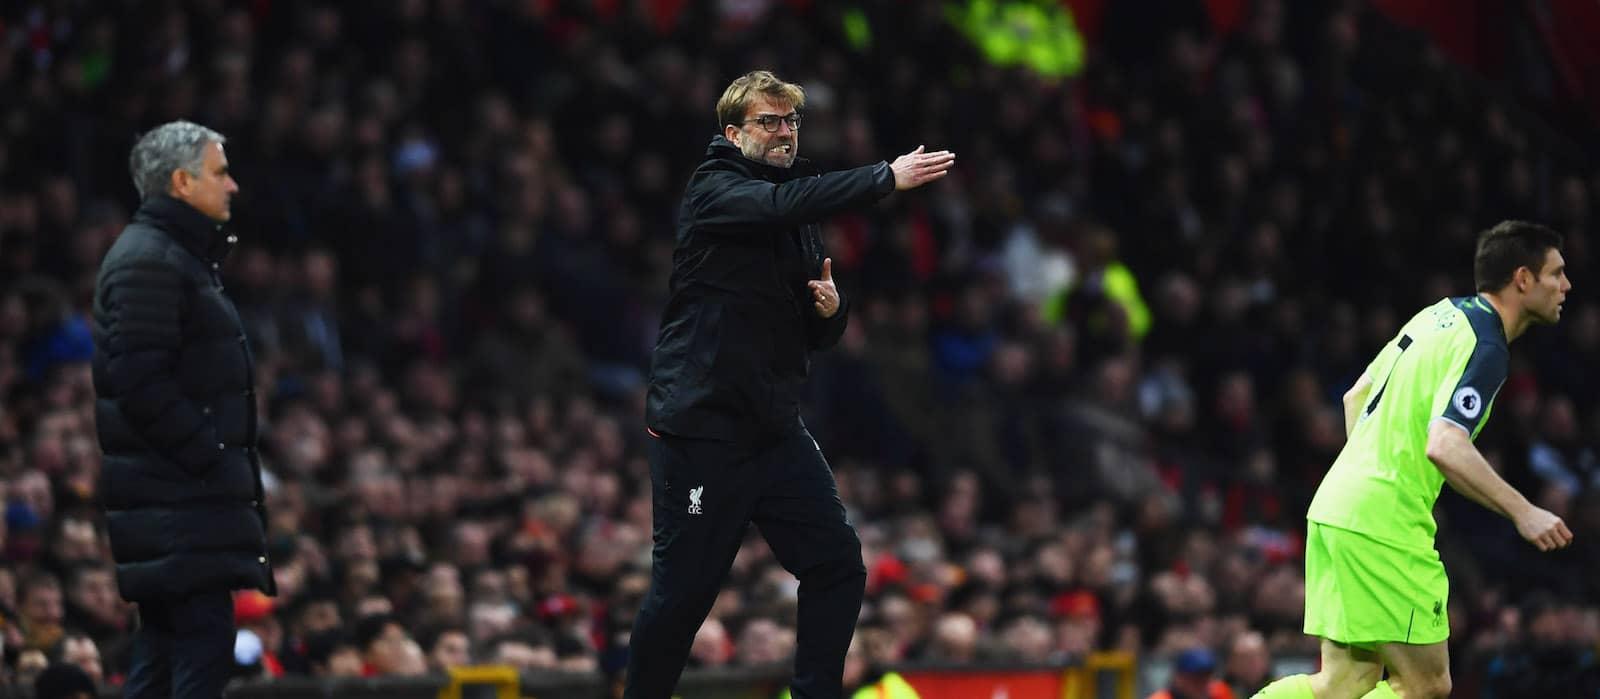 David Ginola explains why Liverpool will miss Sadio Mane against Manchester United